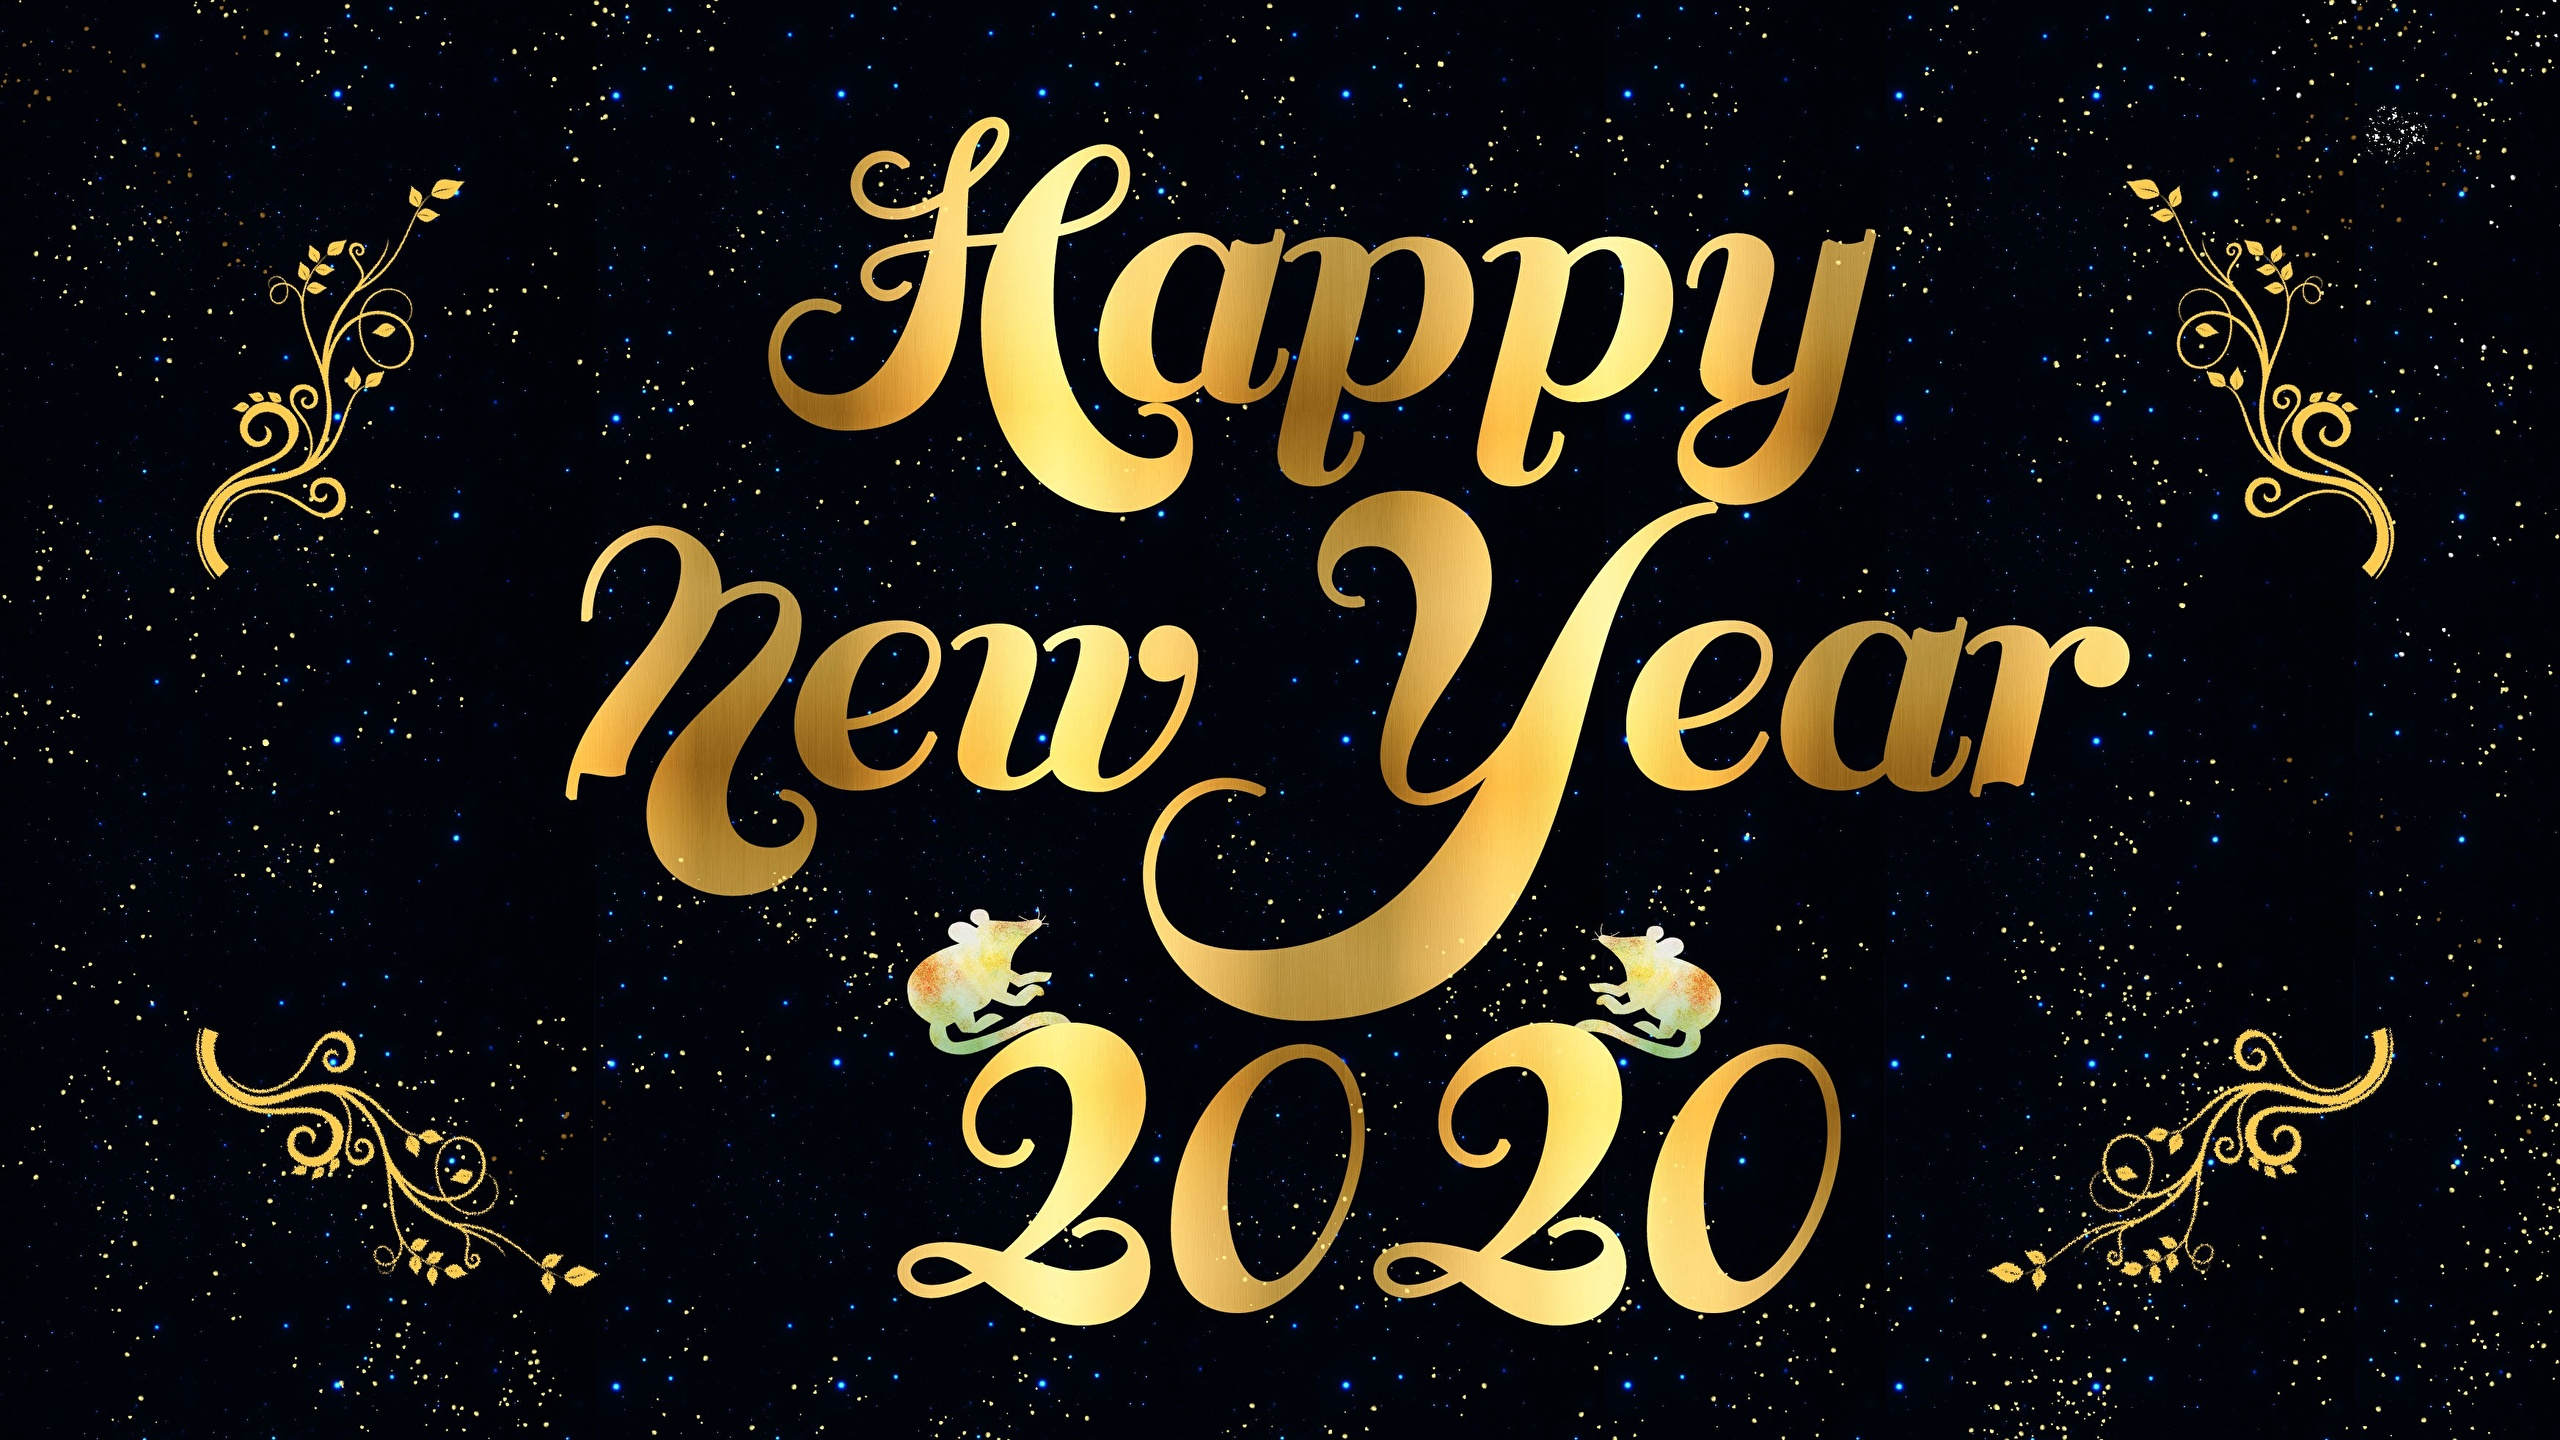 Images 2020 New Year English Black Background 2560x1440